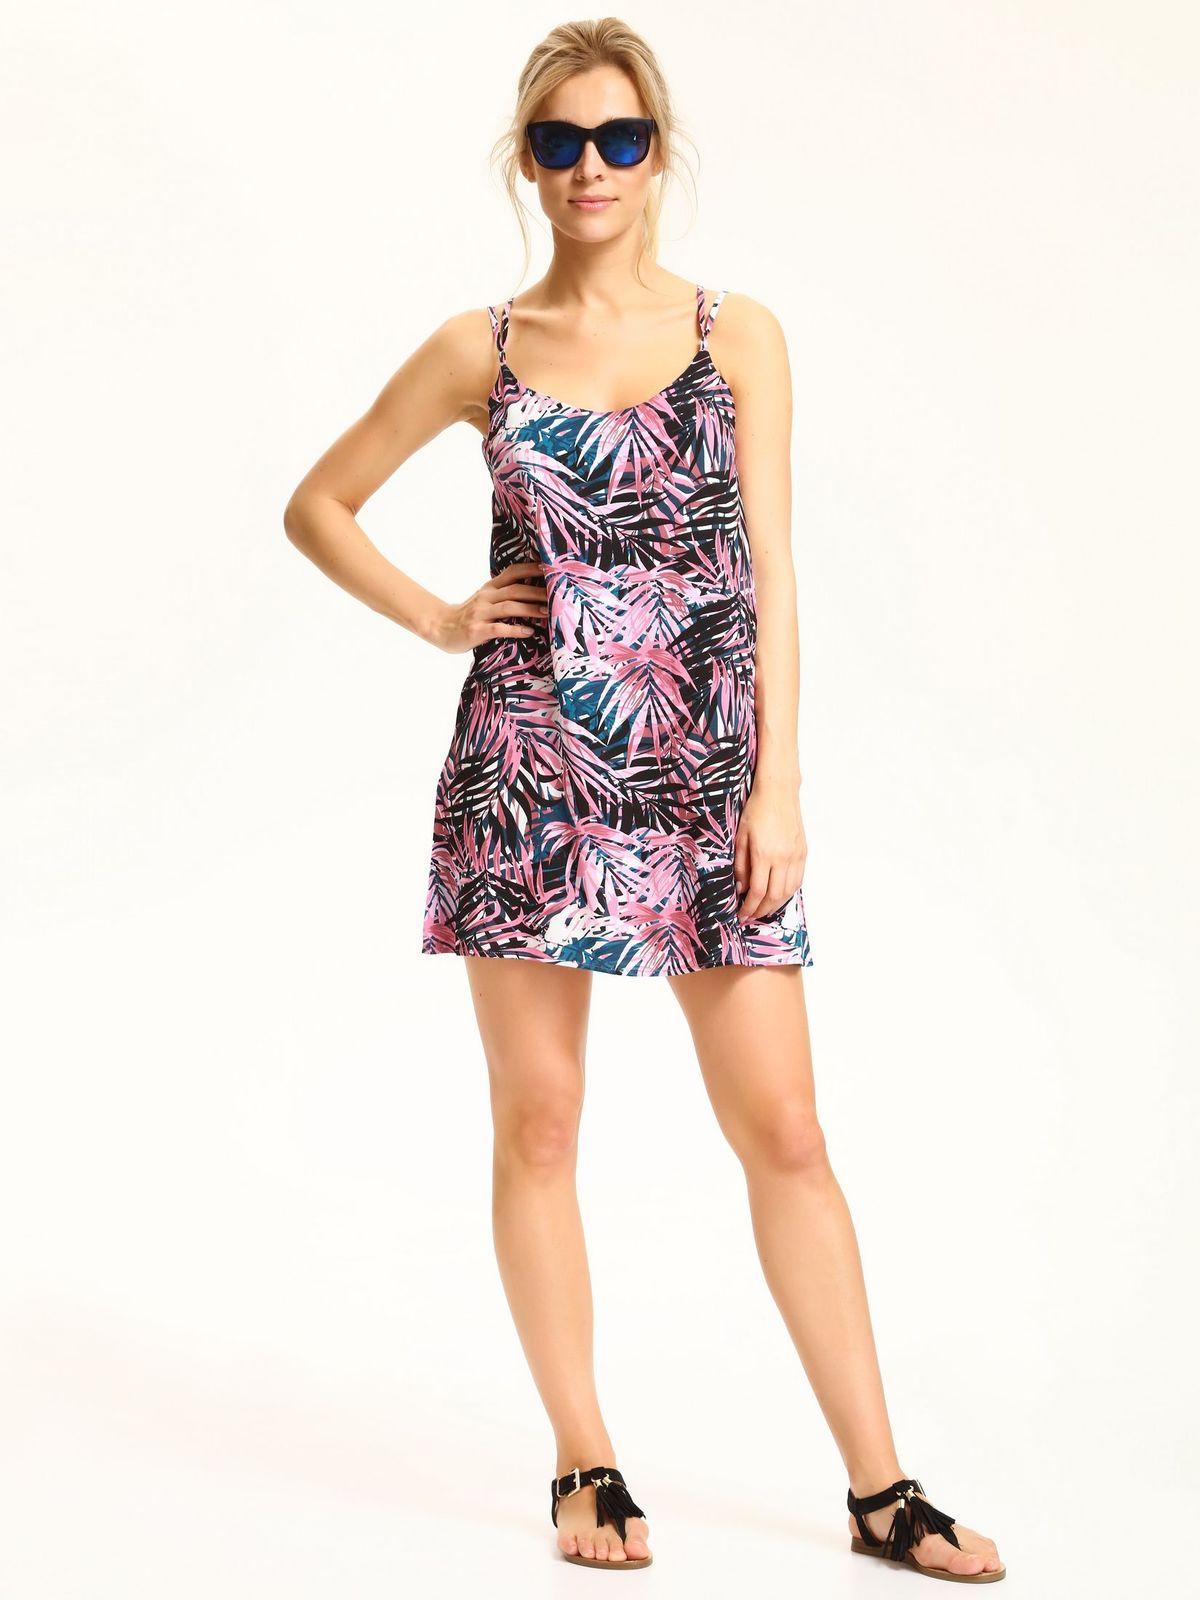 DRYWASH top secret φορεμα με tropical print